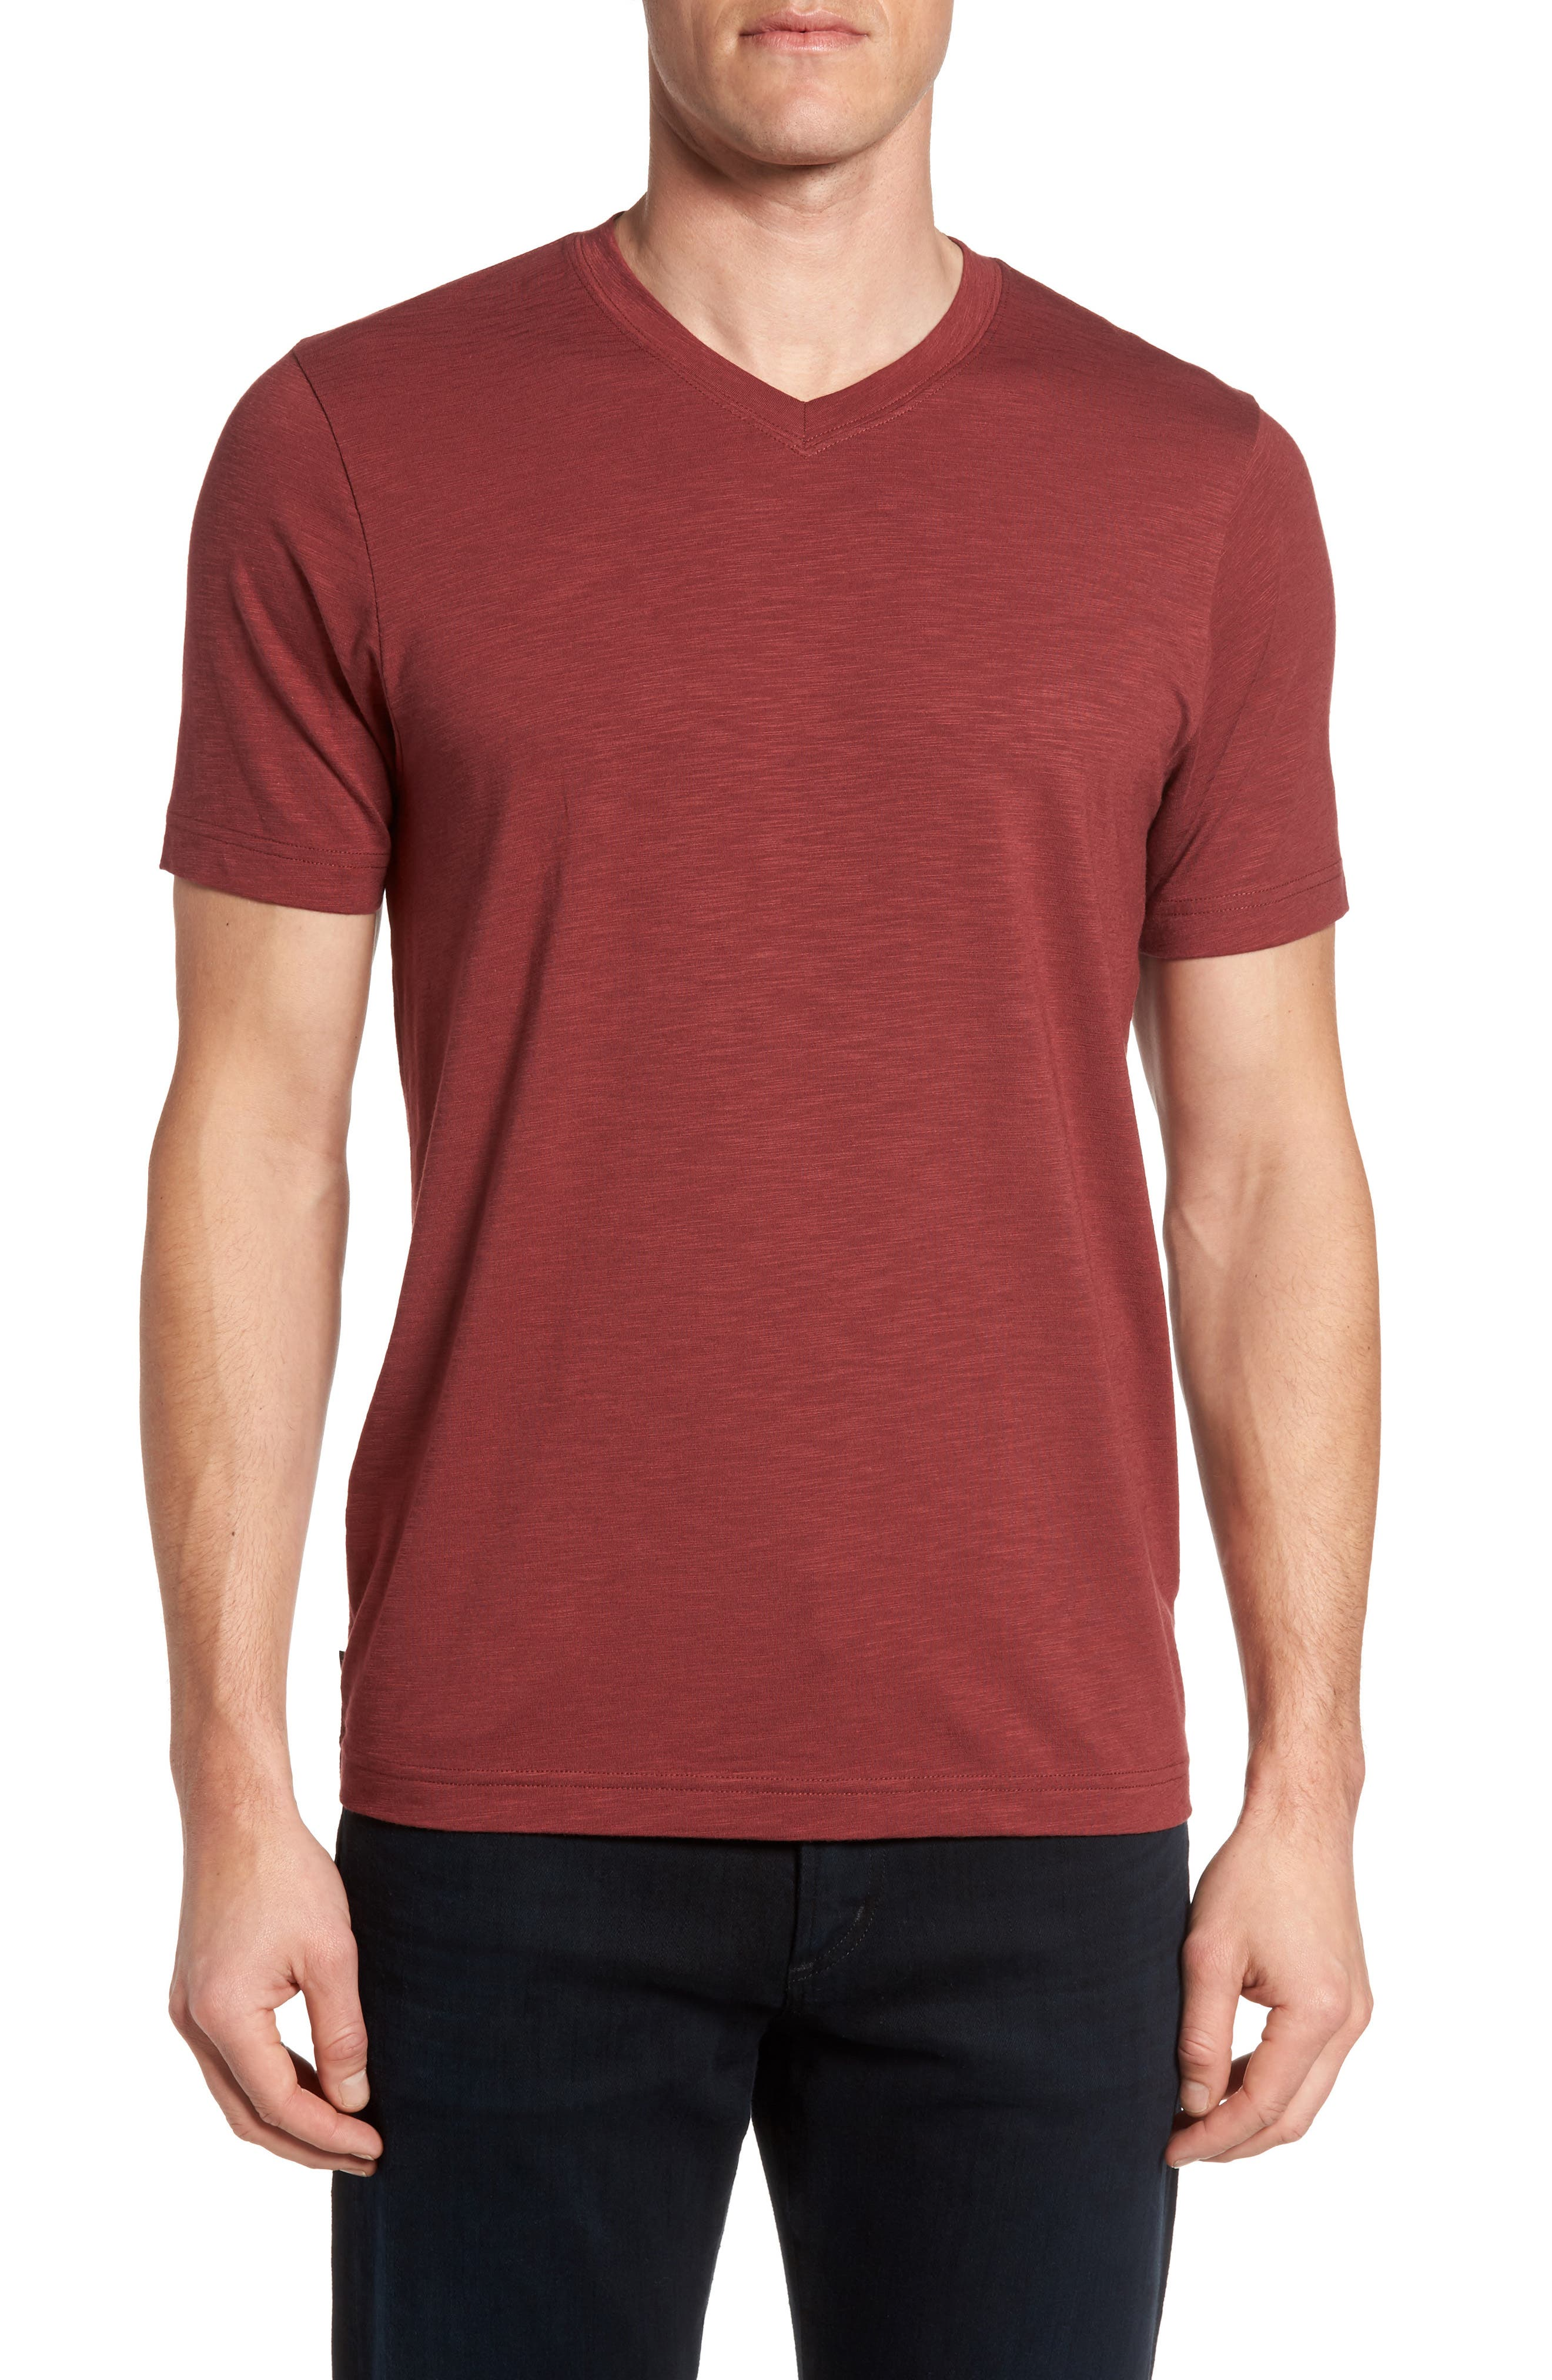 'Trumbull' Trim Fit Slubbed T-Shirt,                             Main thumbnail 1, color,                             Oxblood